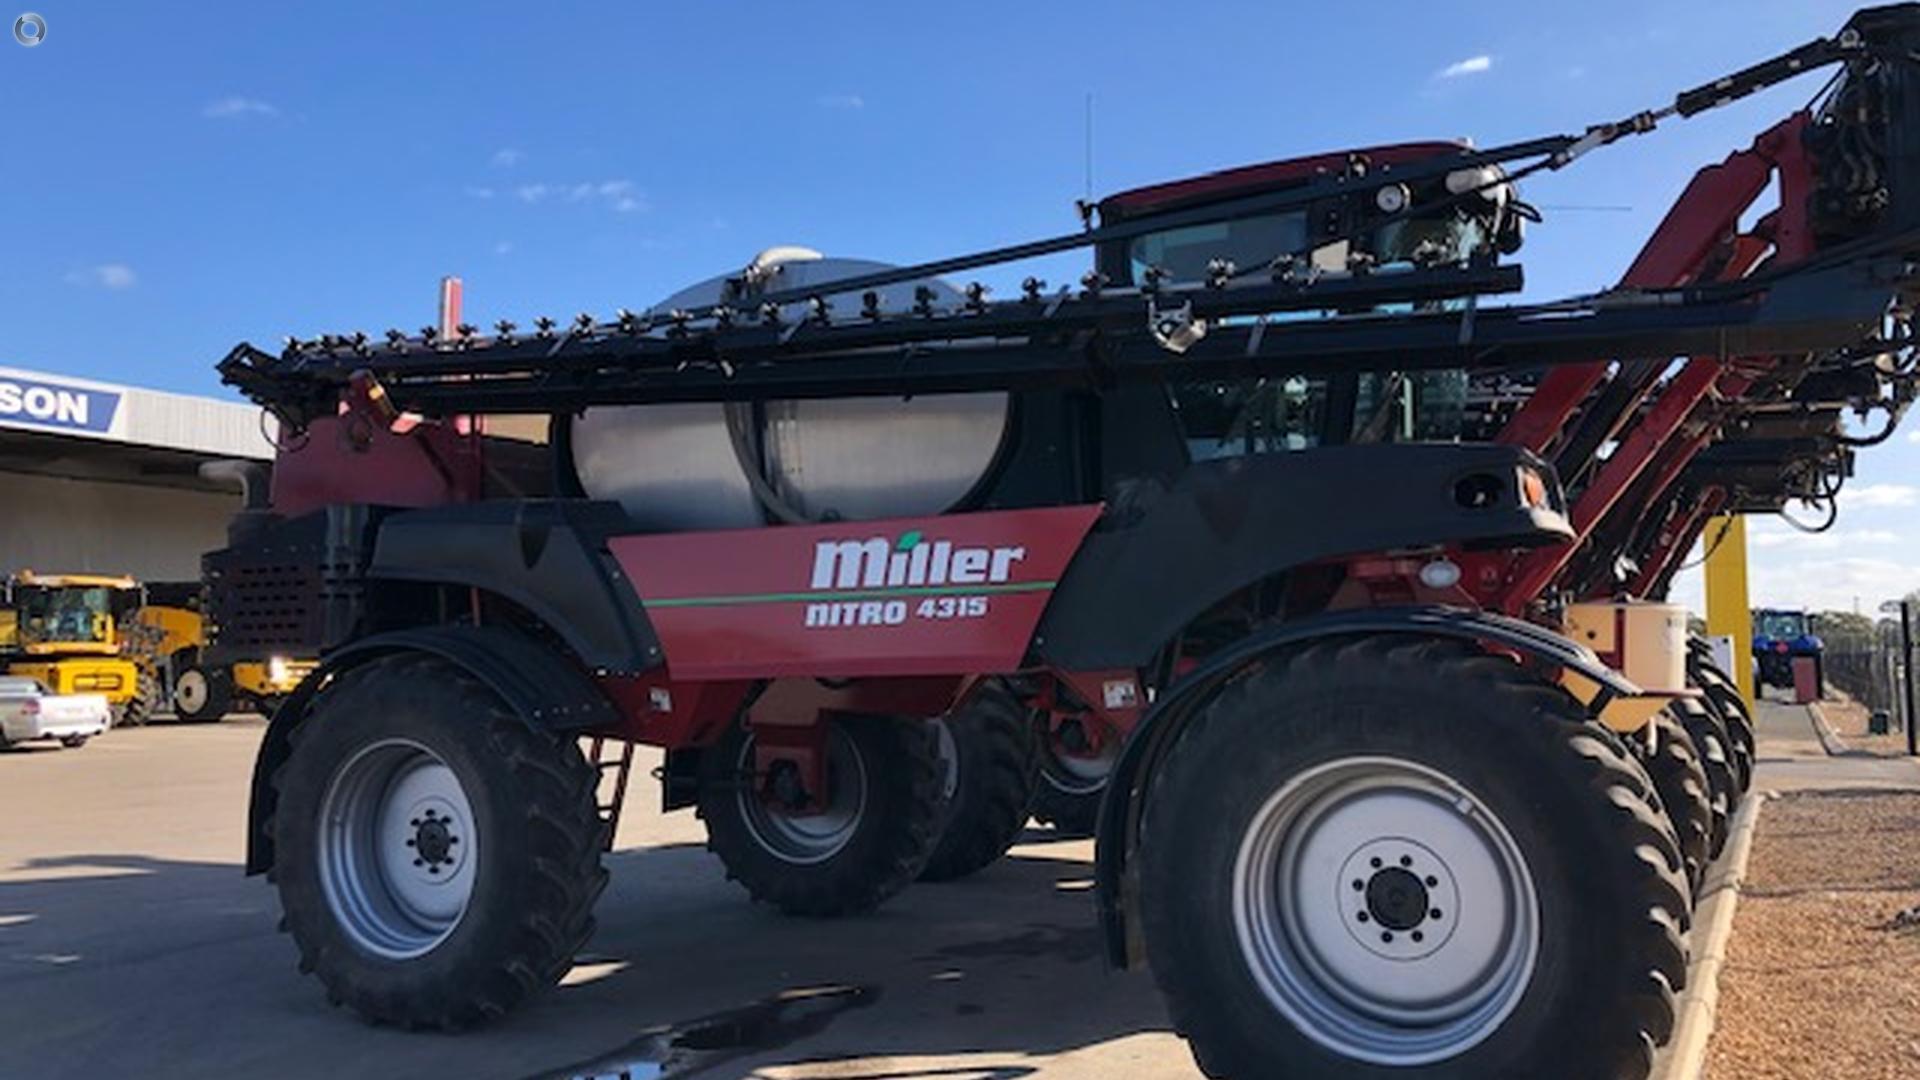 2009 Miller Nitro 4315 Sprayer